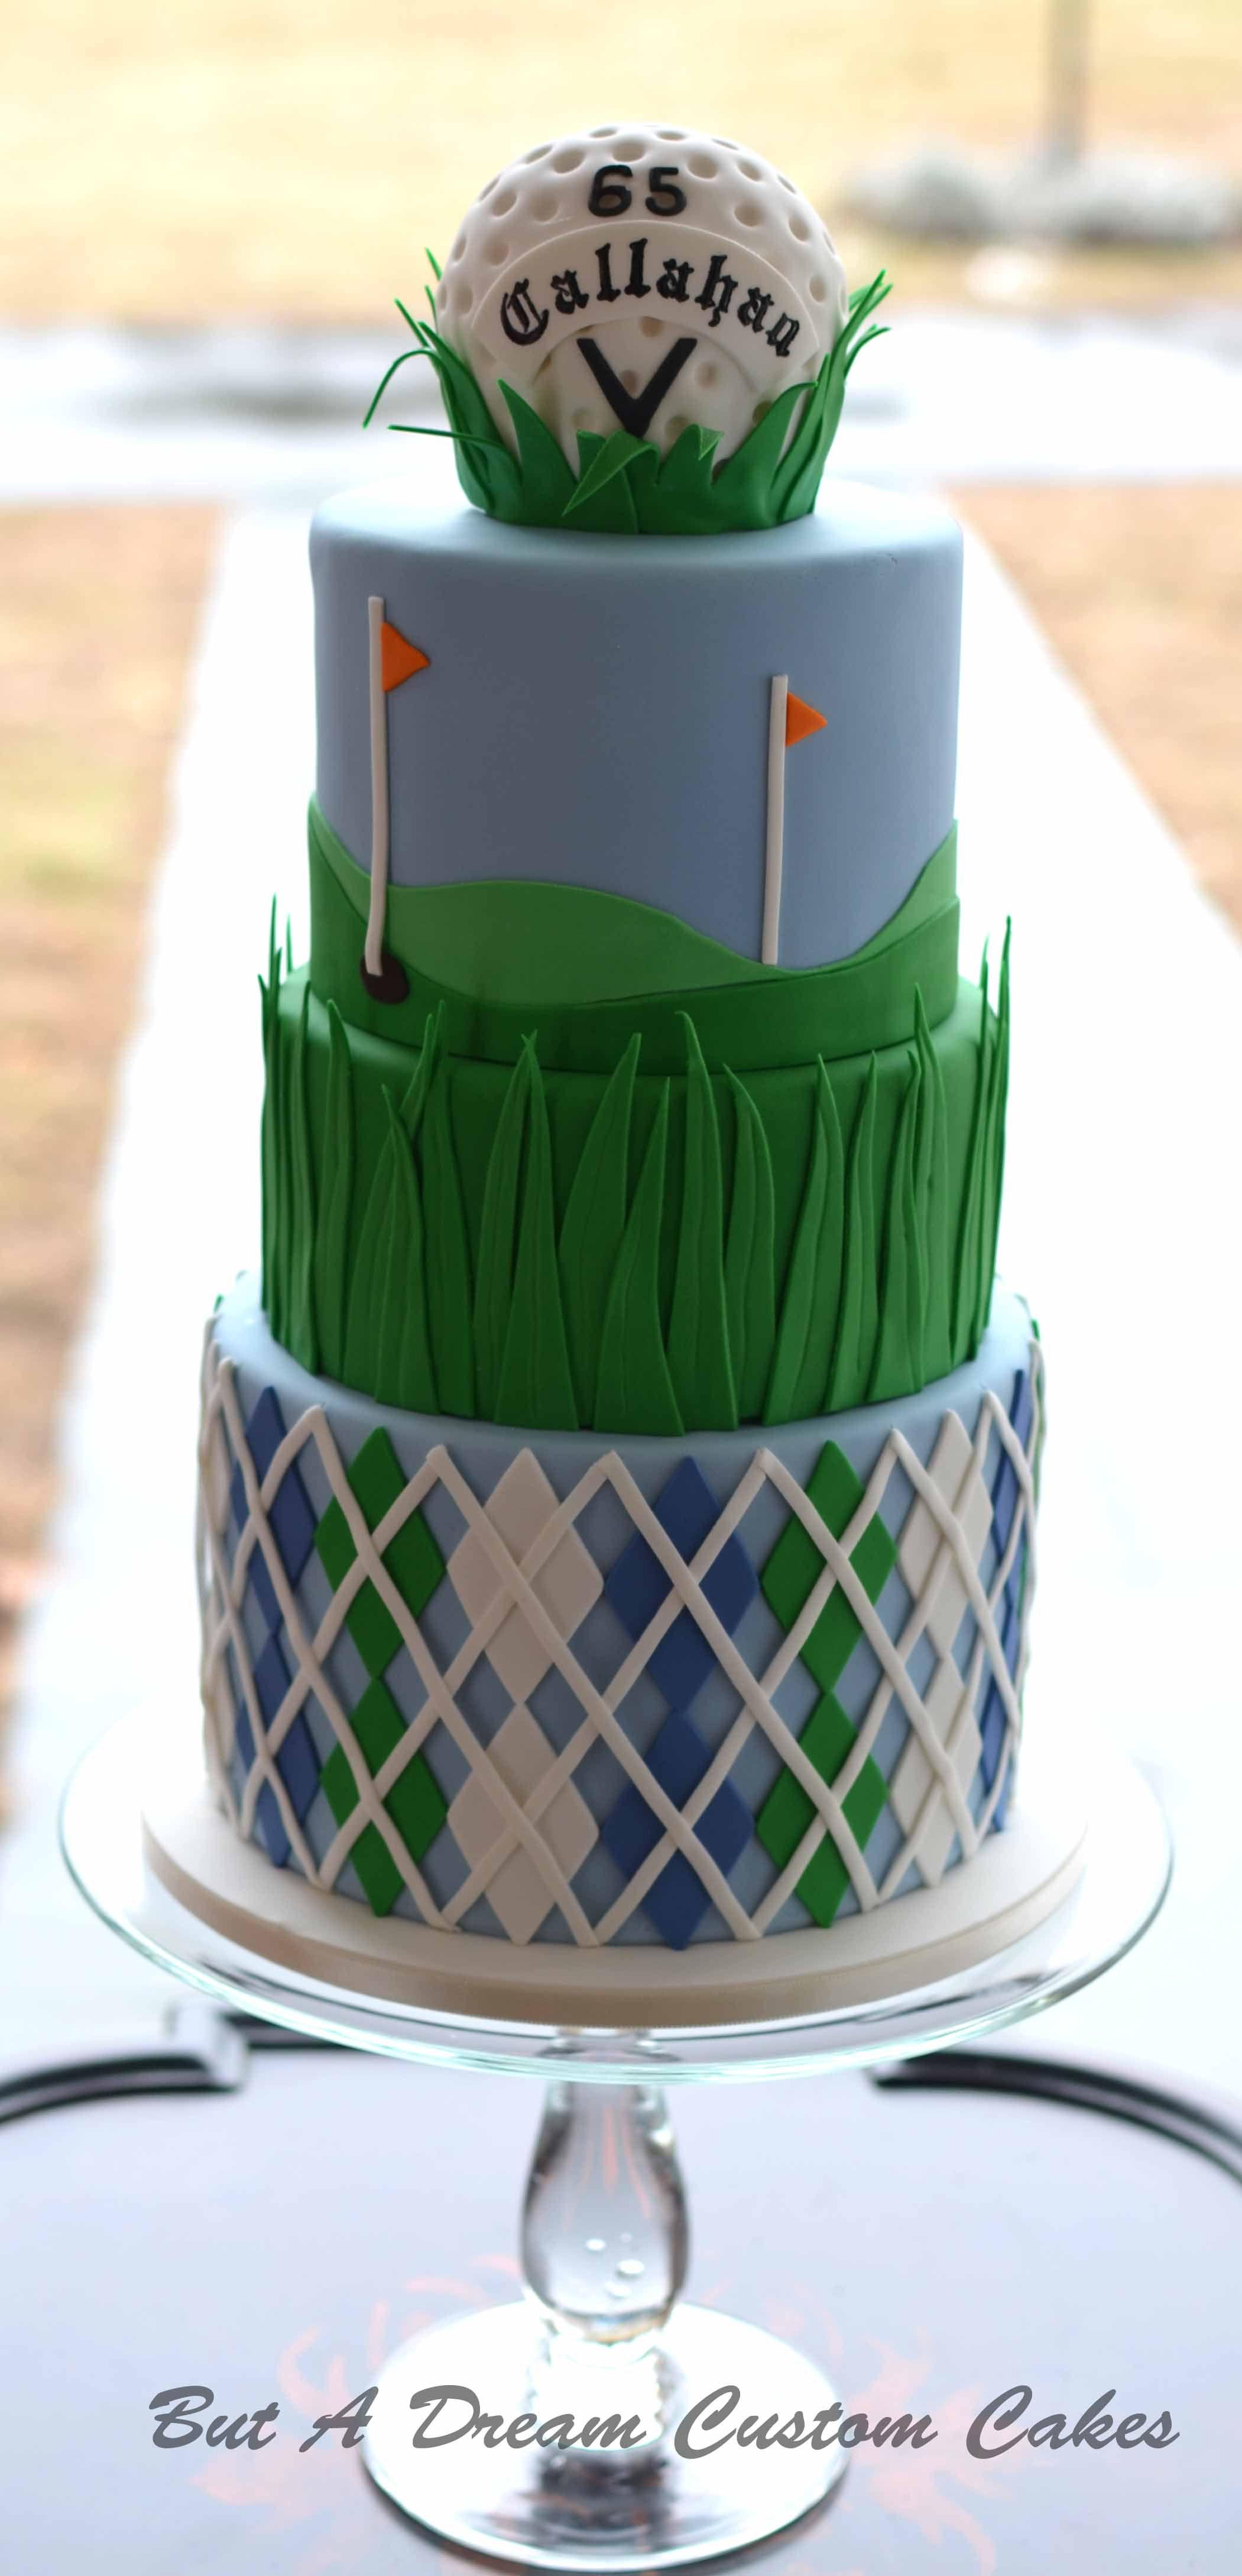 Golf ball birthday cake But A Dream Custom Cakes Pinterest